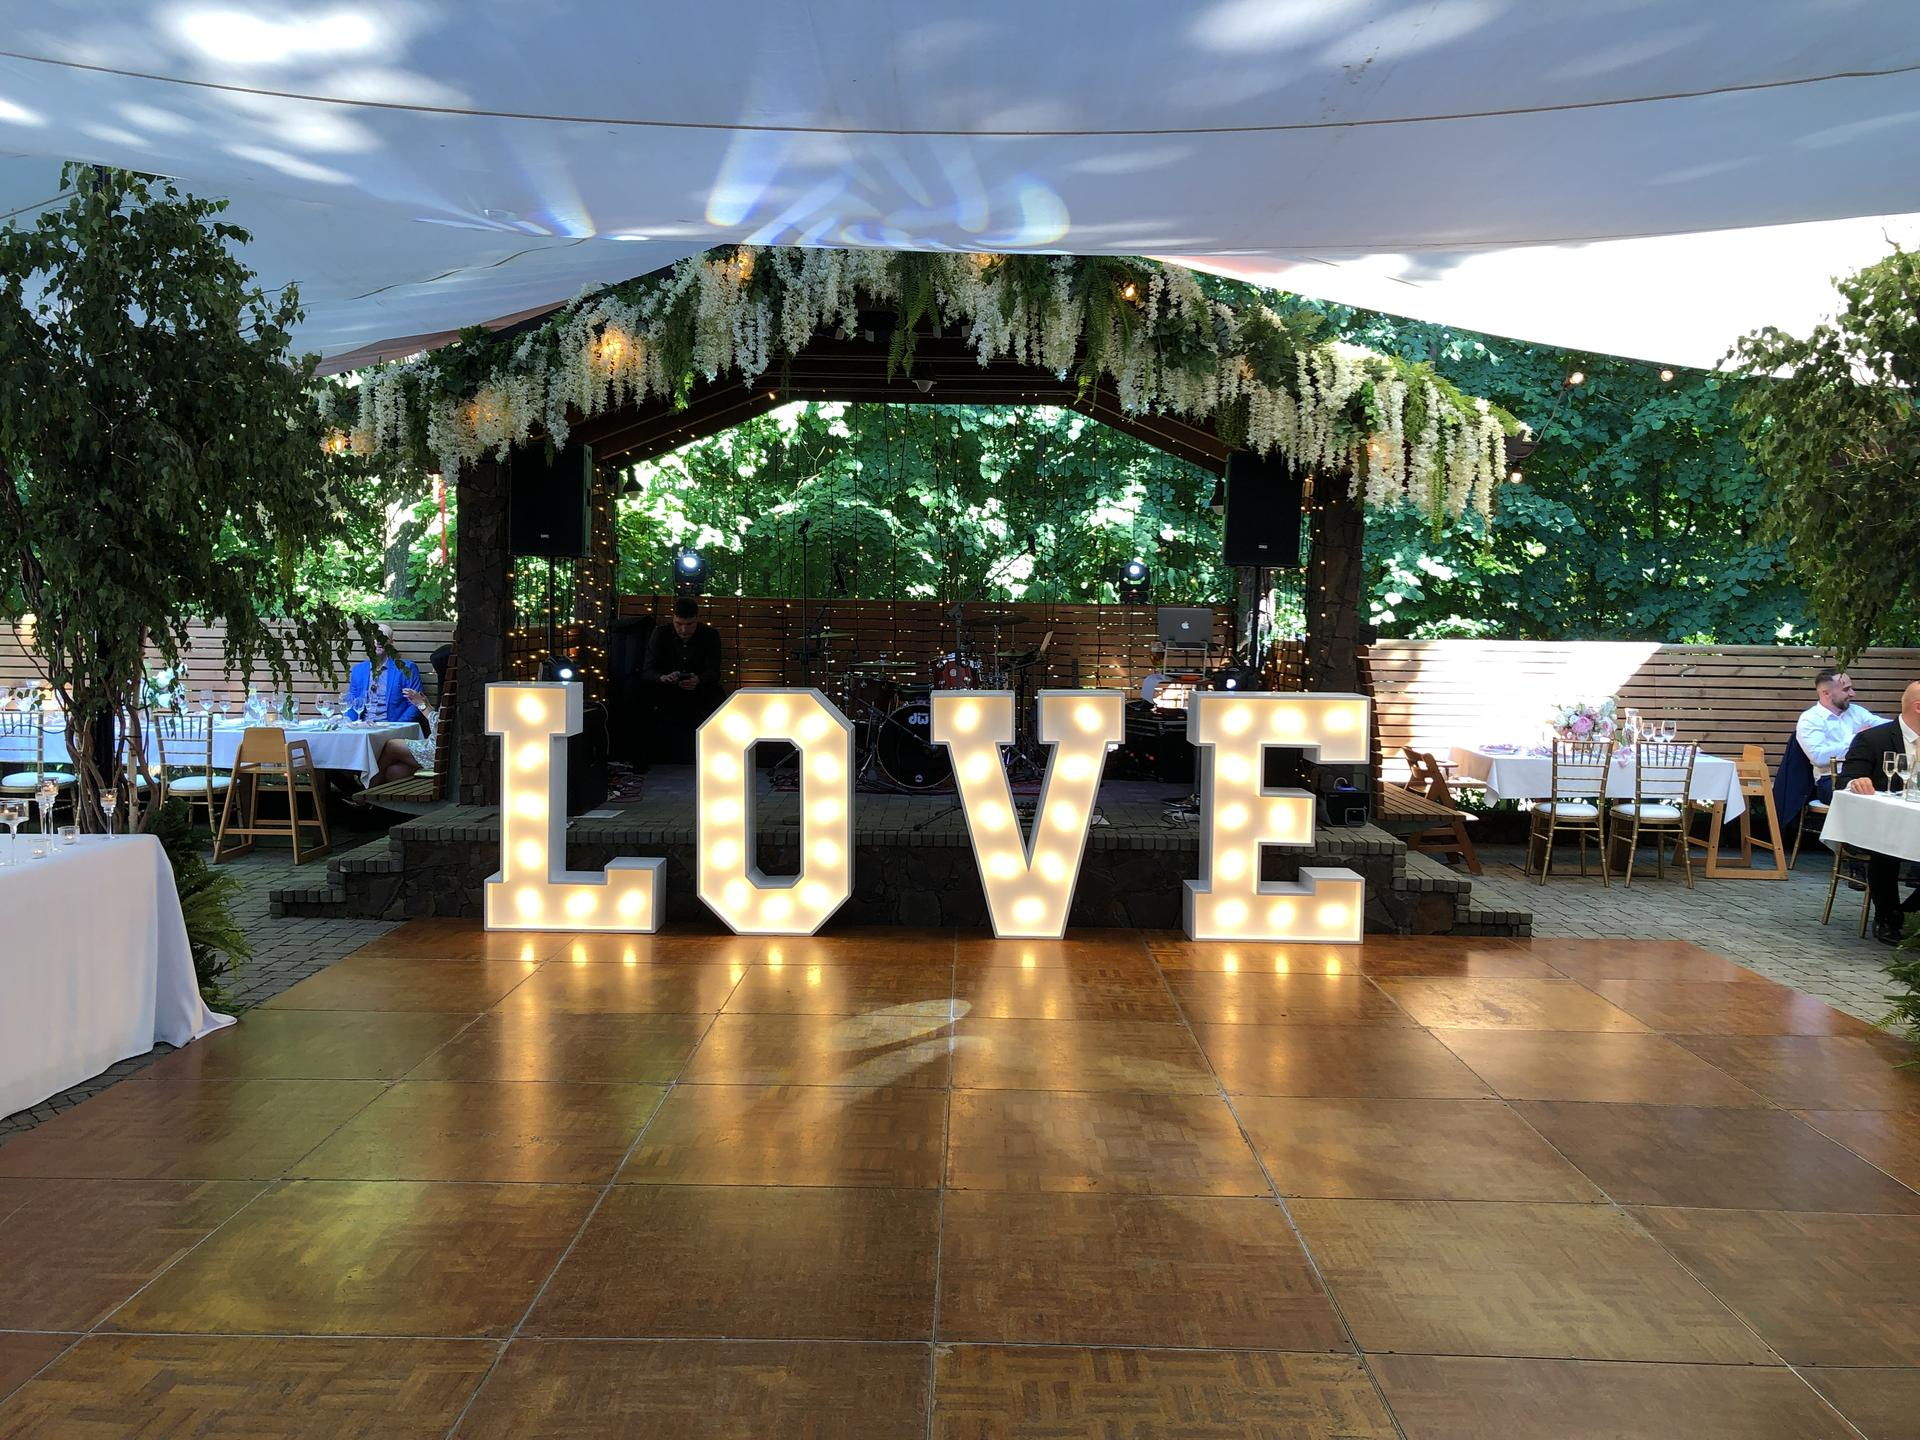 3dekoracie - svetelný 3D nápis LOVE